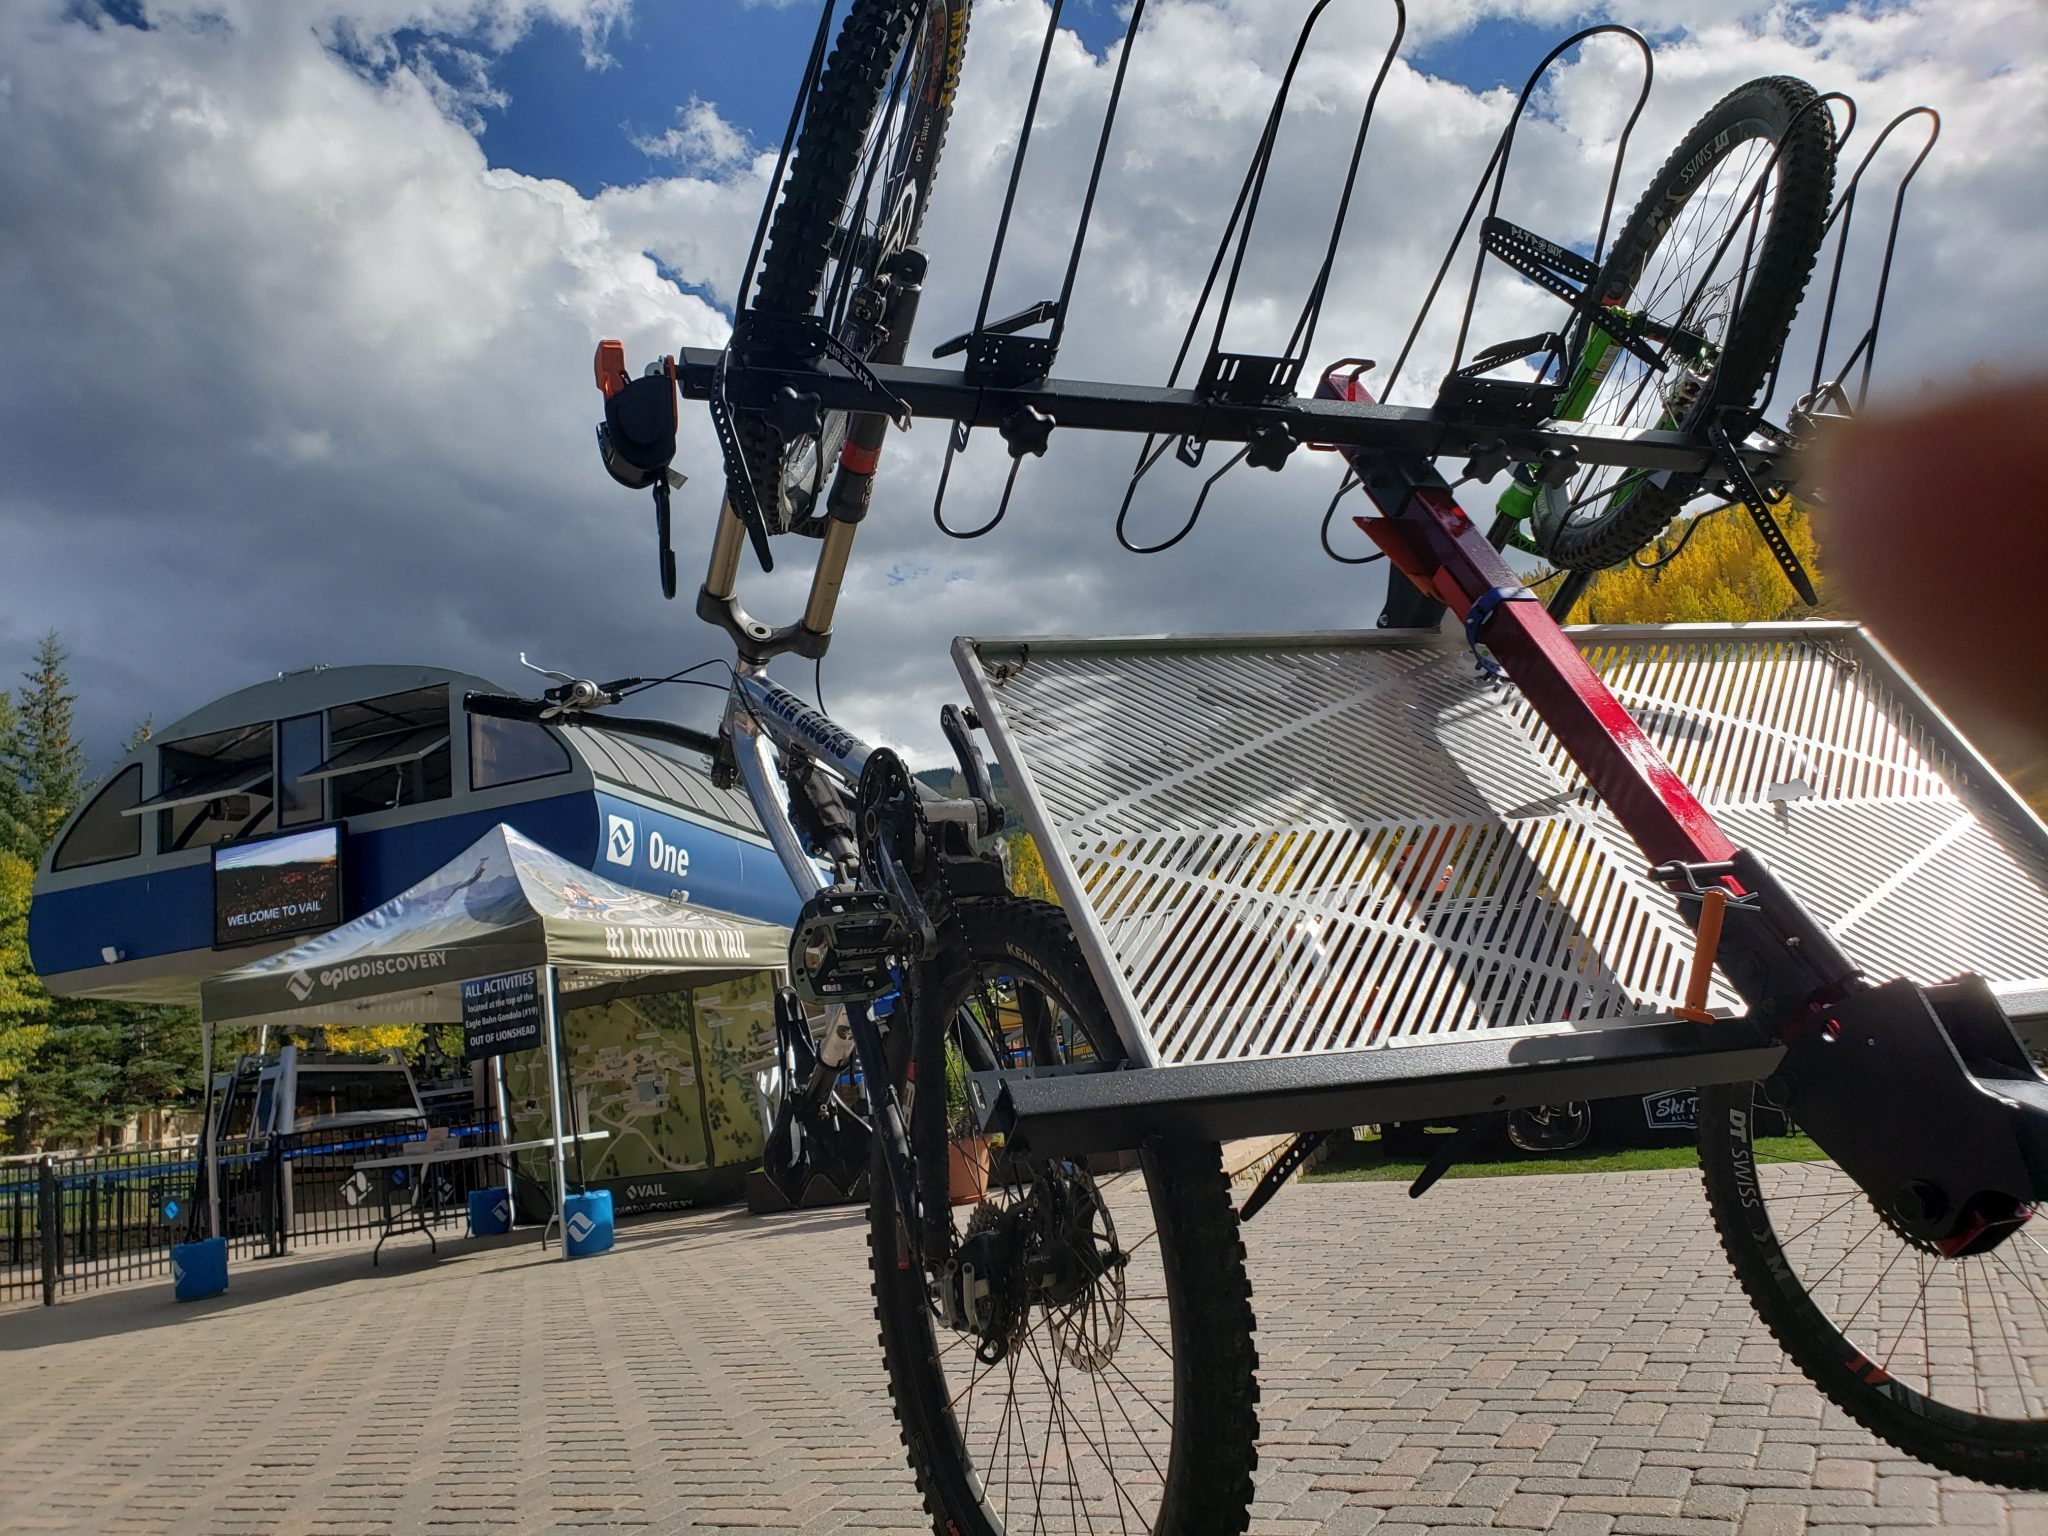 alta racks, alta six, four carrier, bike rack, bicycle, mountain bikes, road bikes, cycling, thule, yakima, kuat, riding, dirt, road, recon racks, lolo racks, all racks, vertical hitch racks, best rack, best bike rack, best bicycle rack, hitch, truck, shuttle, northshore racks, hangover, NSR, RR,